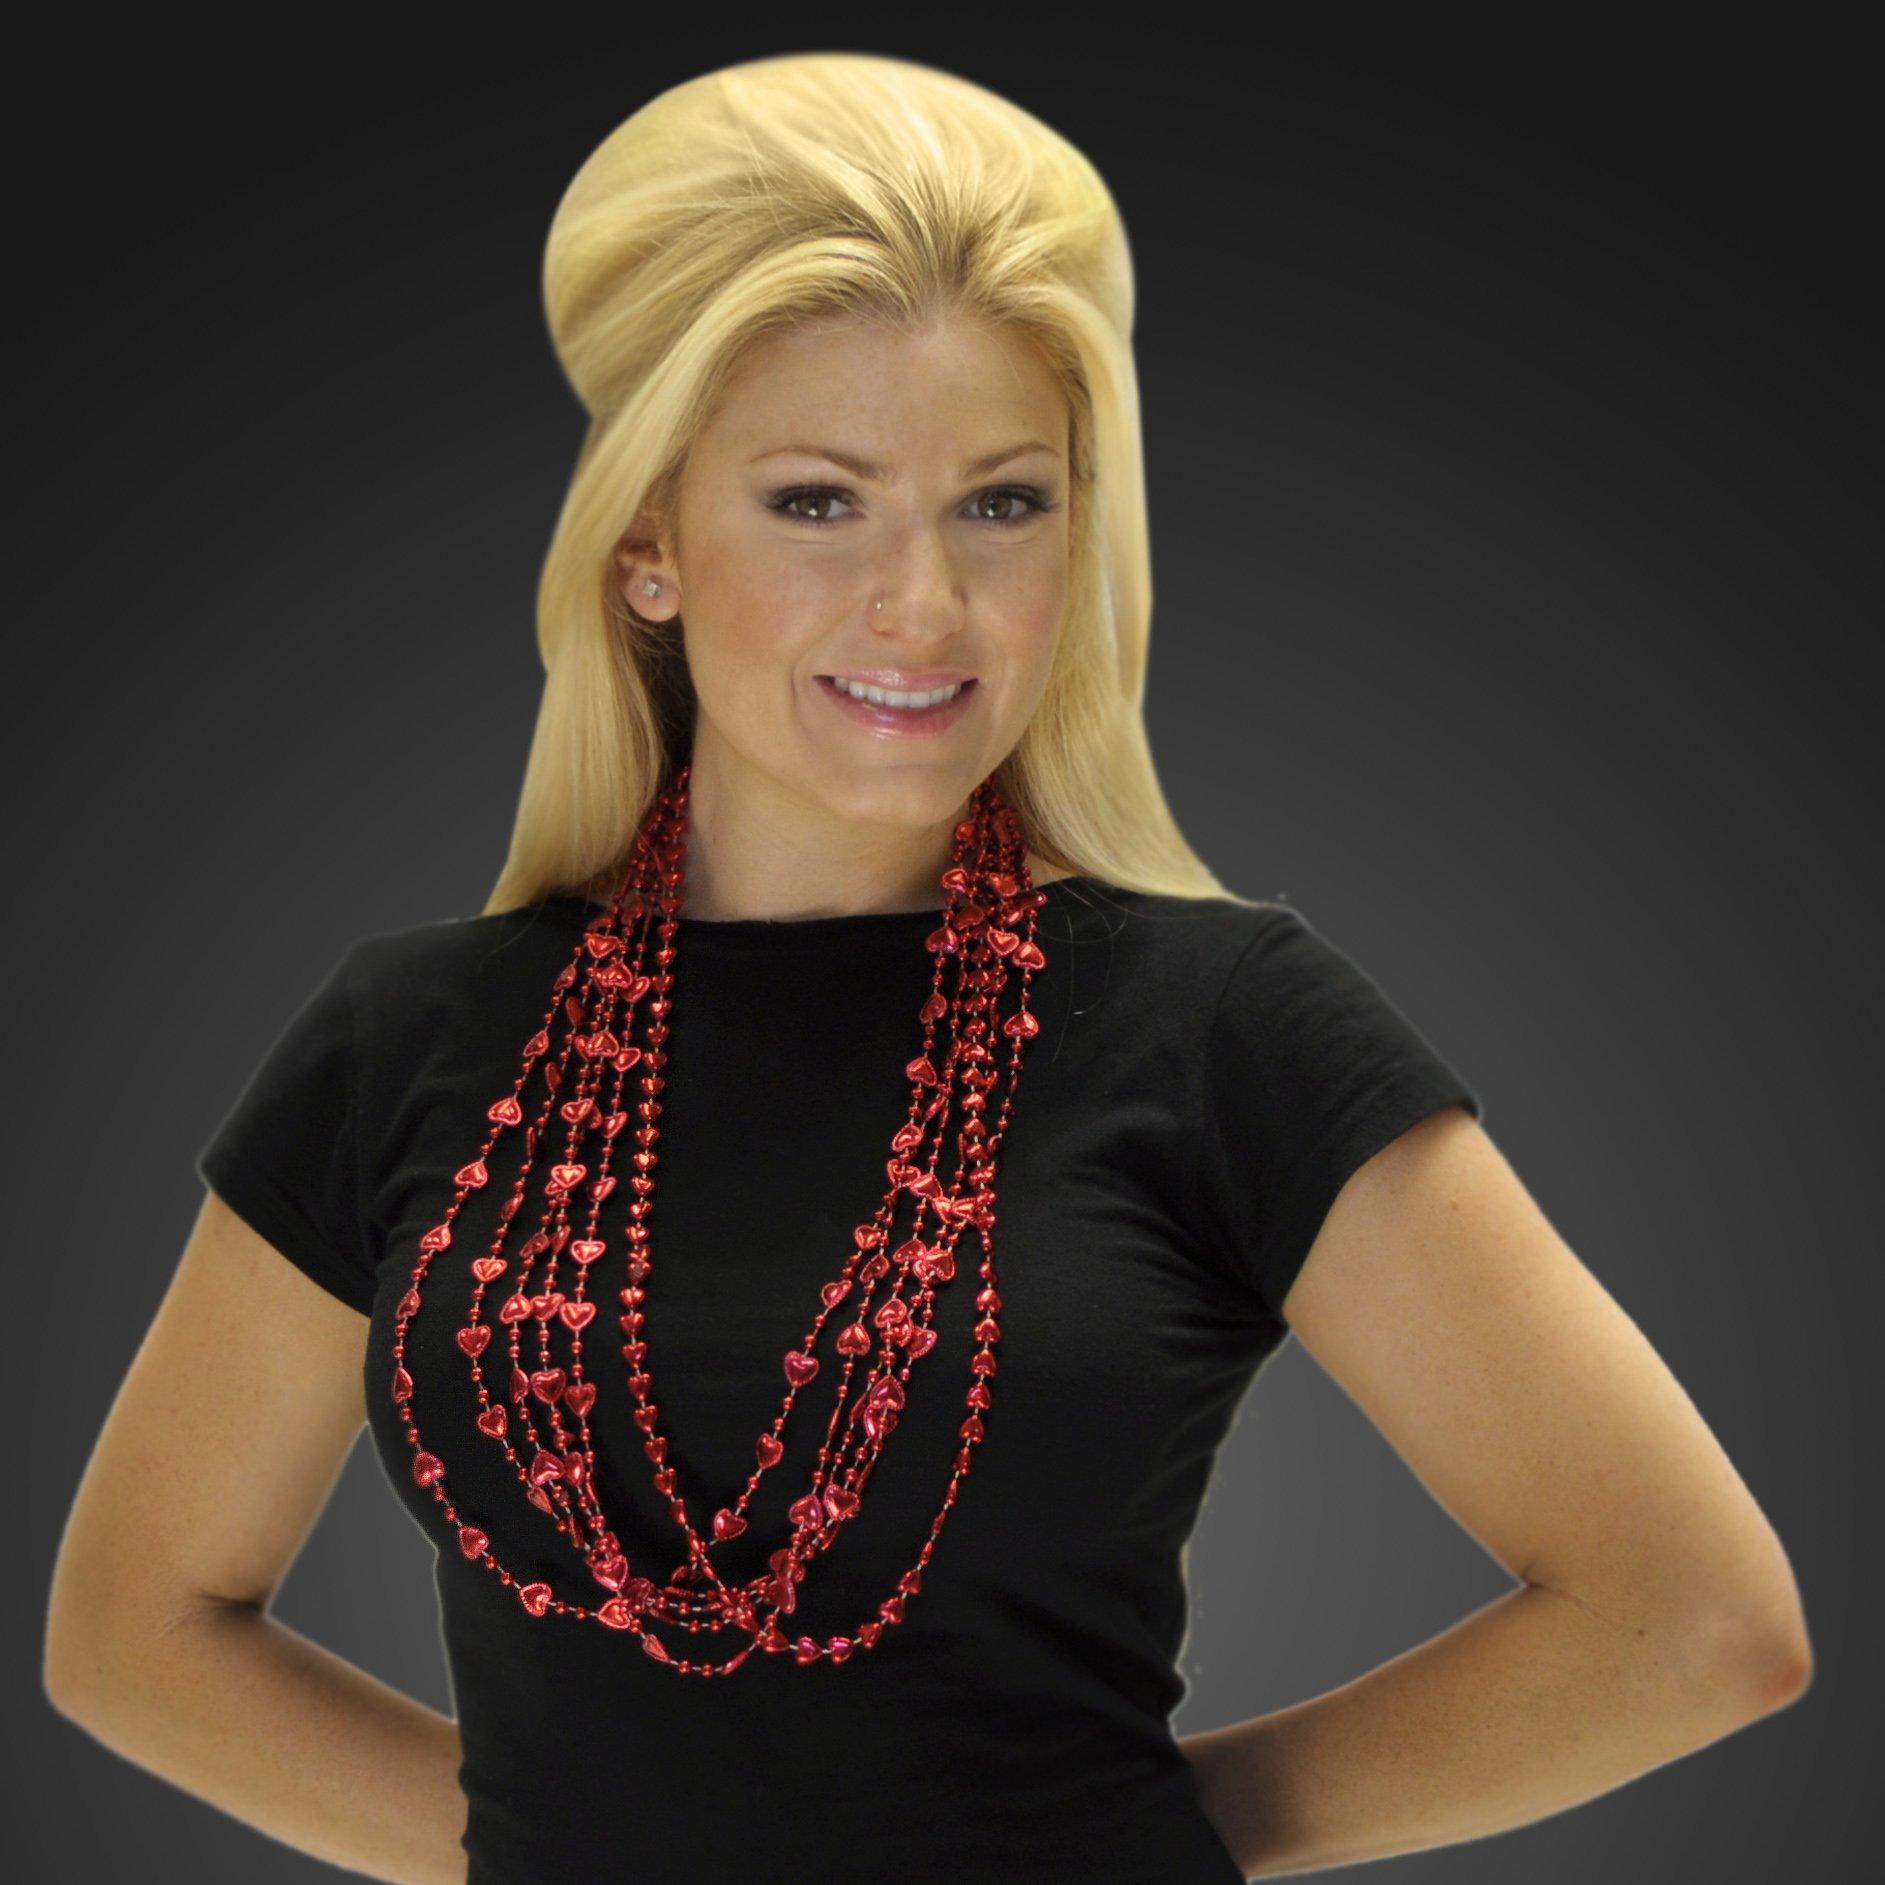 FlashingBlinkyLights Red Heart Mardi Gras Bead Necklaces (Set of 48)